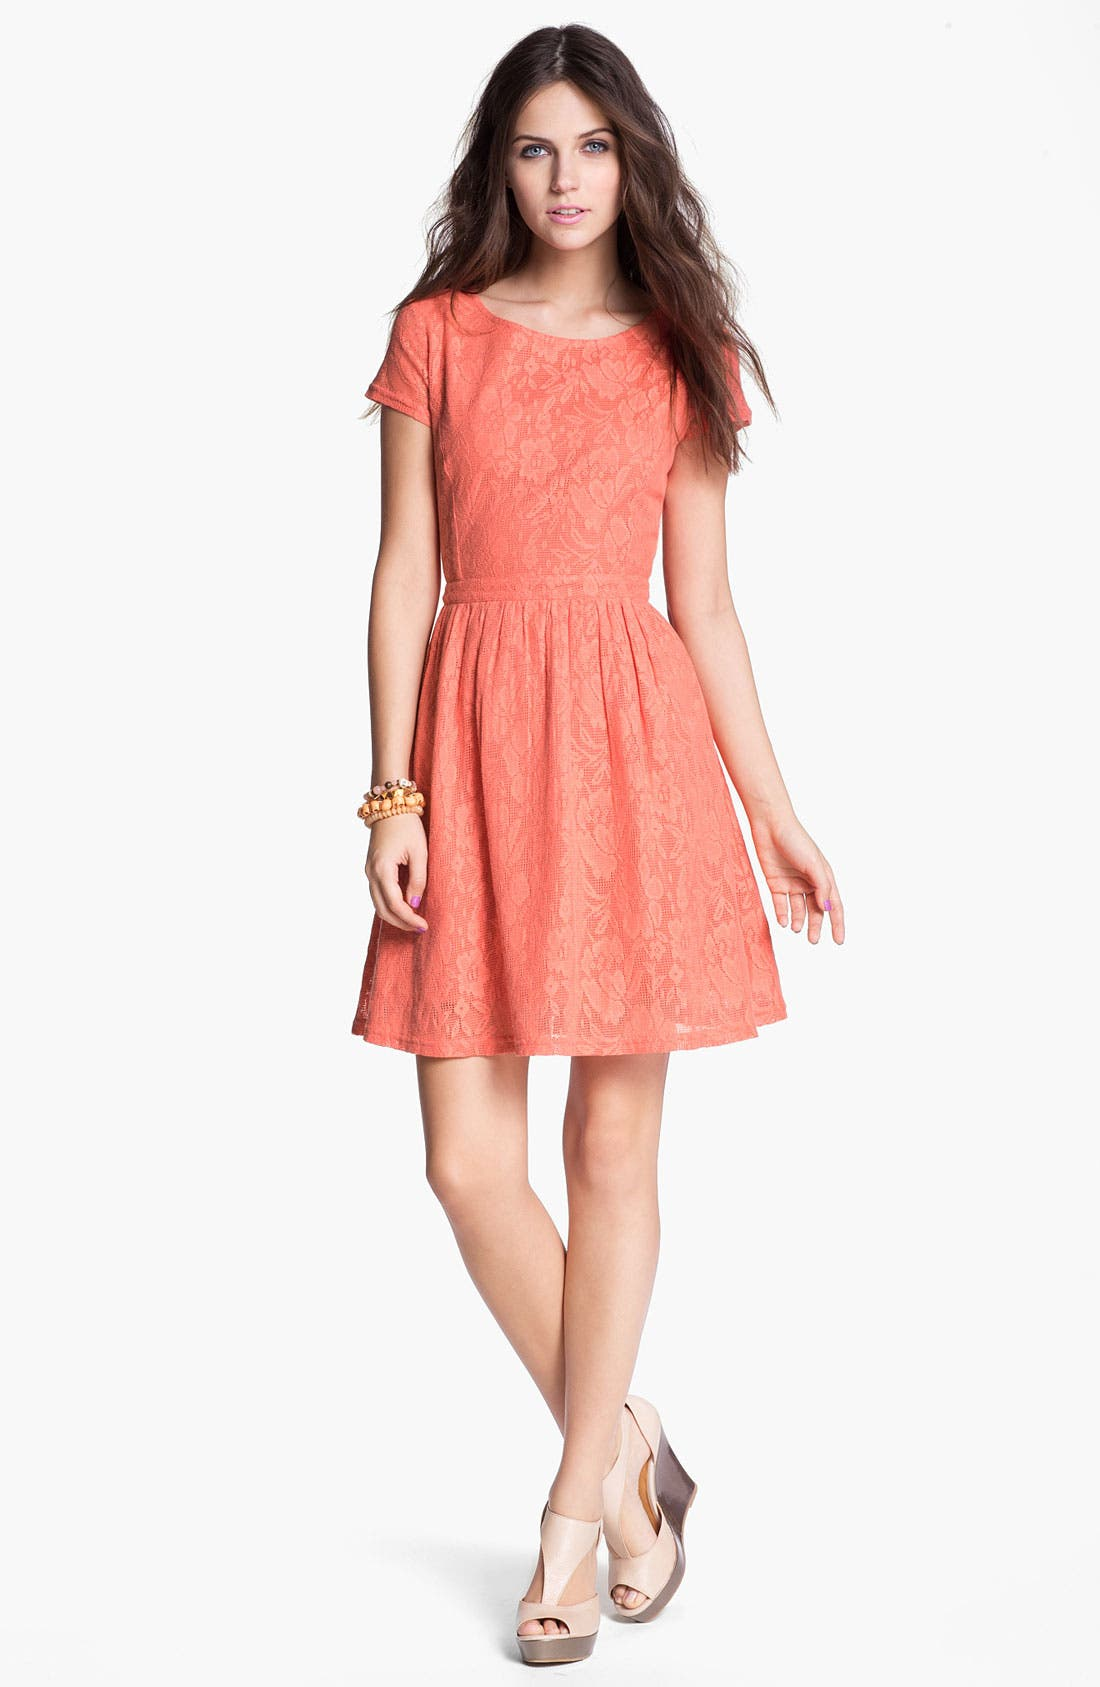 Alternate Image 1 Selected - Frenchi Cutout Back Lace Dress (Juniors)